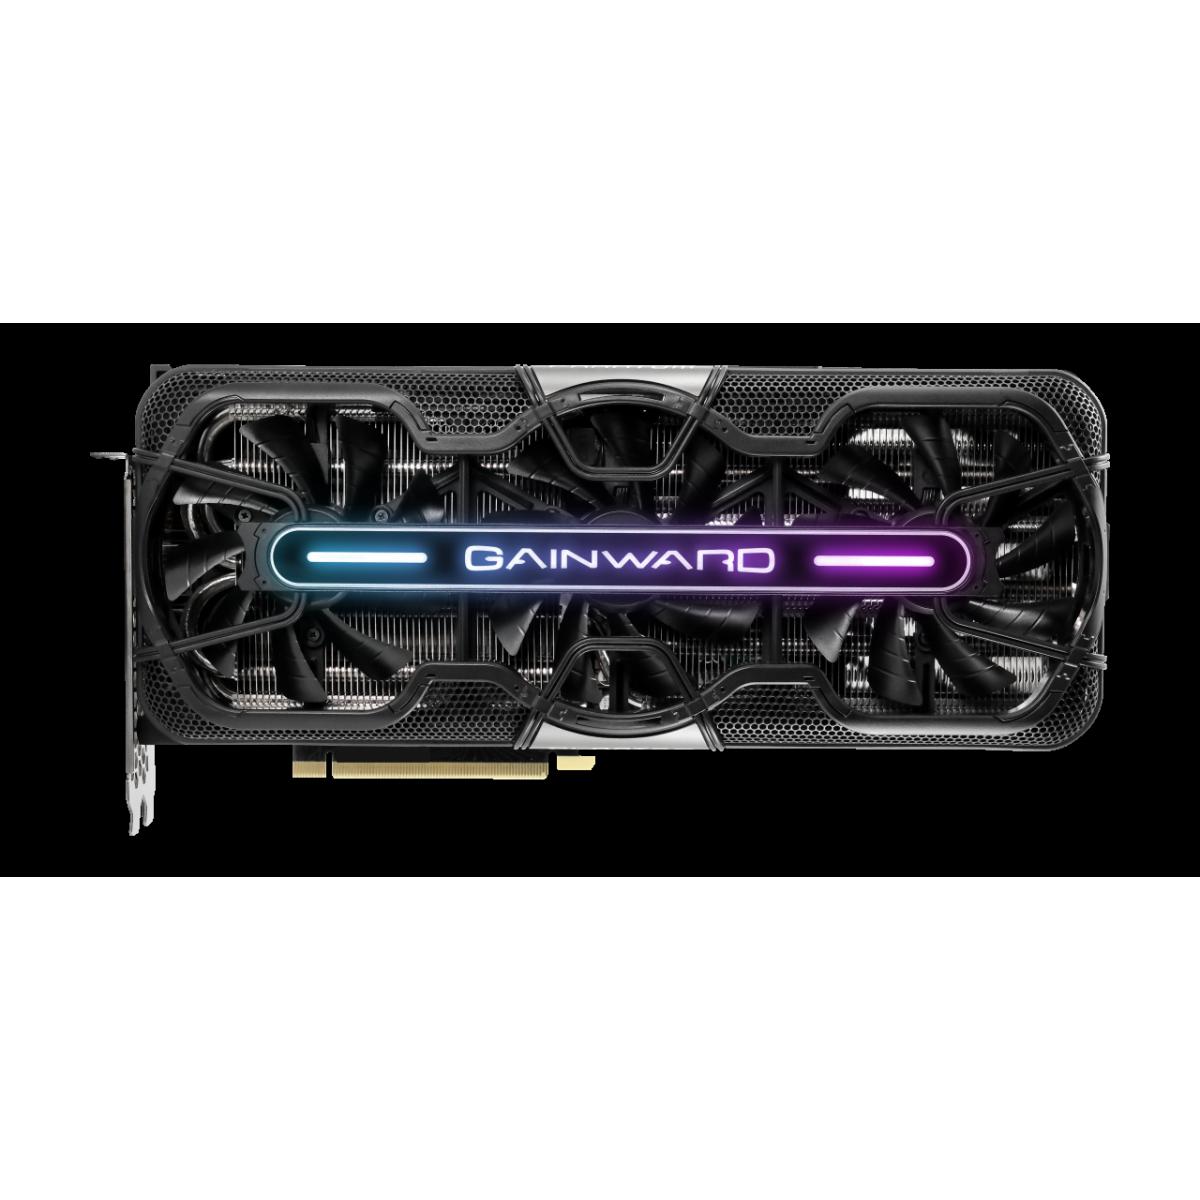 Placa de Vídeo Gainward, GeForce RTX 3070 Phantom, 8GB, GDDR6, 256Bit, NE63070019P2-1040P